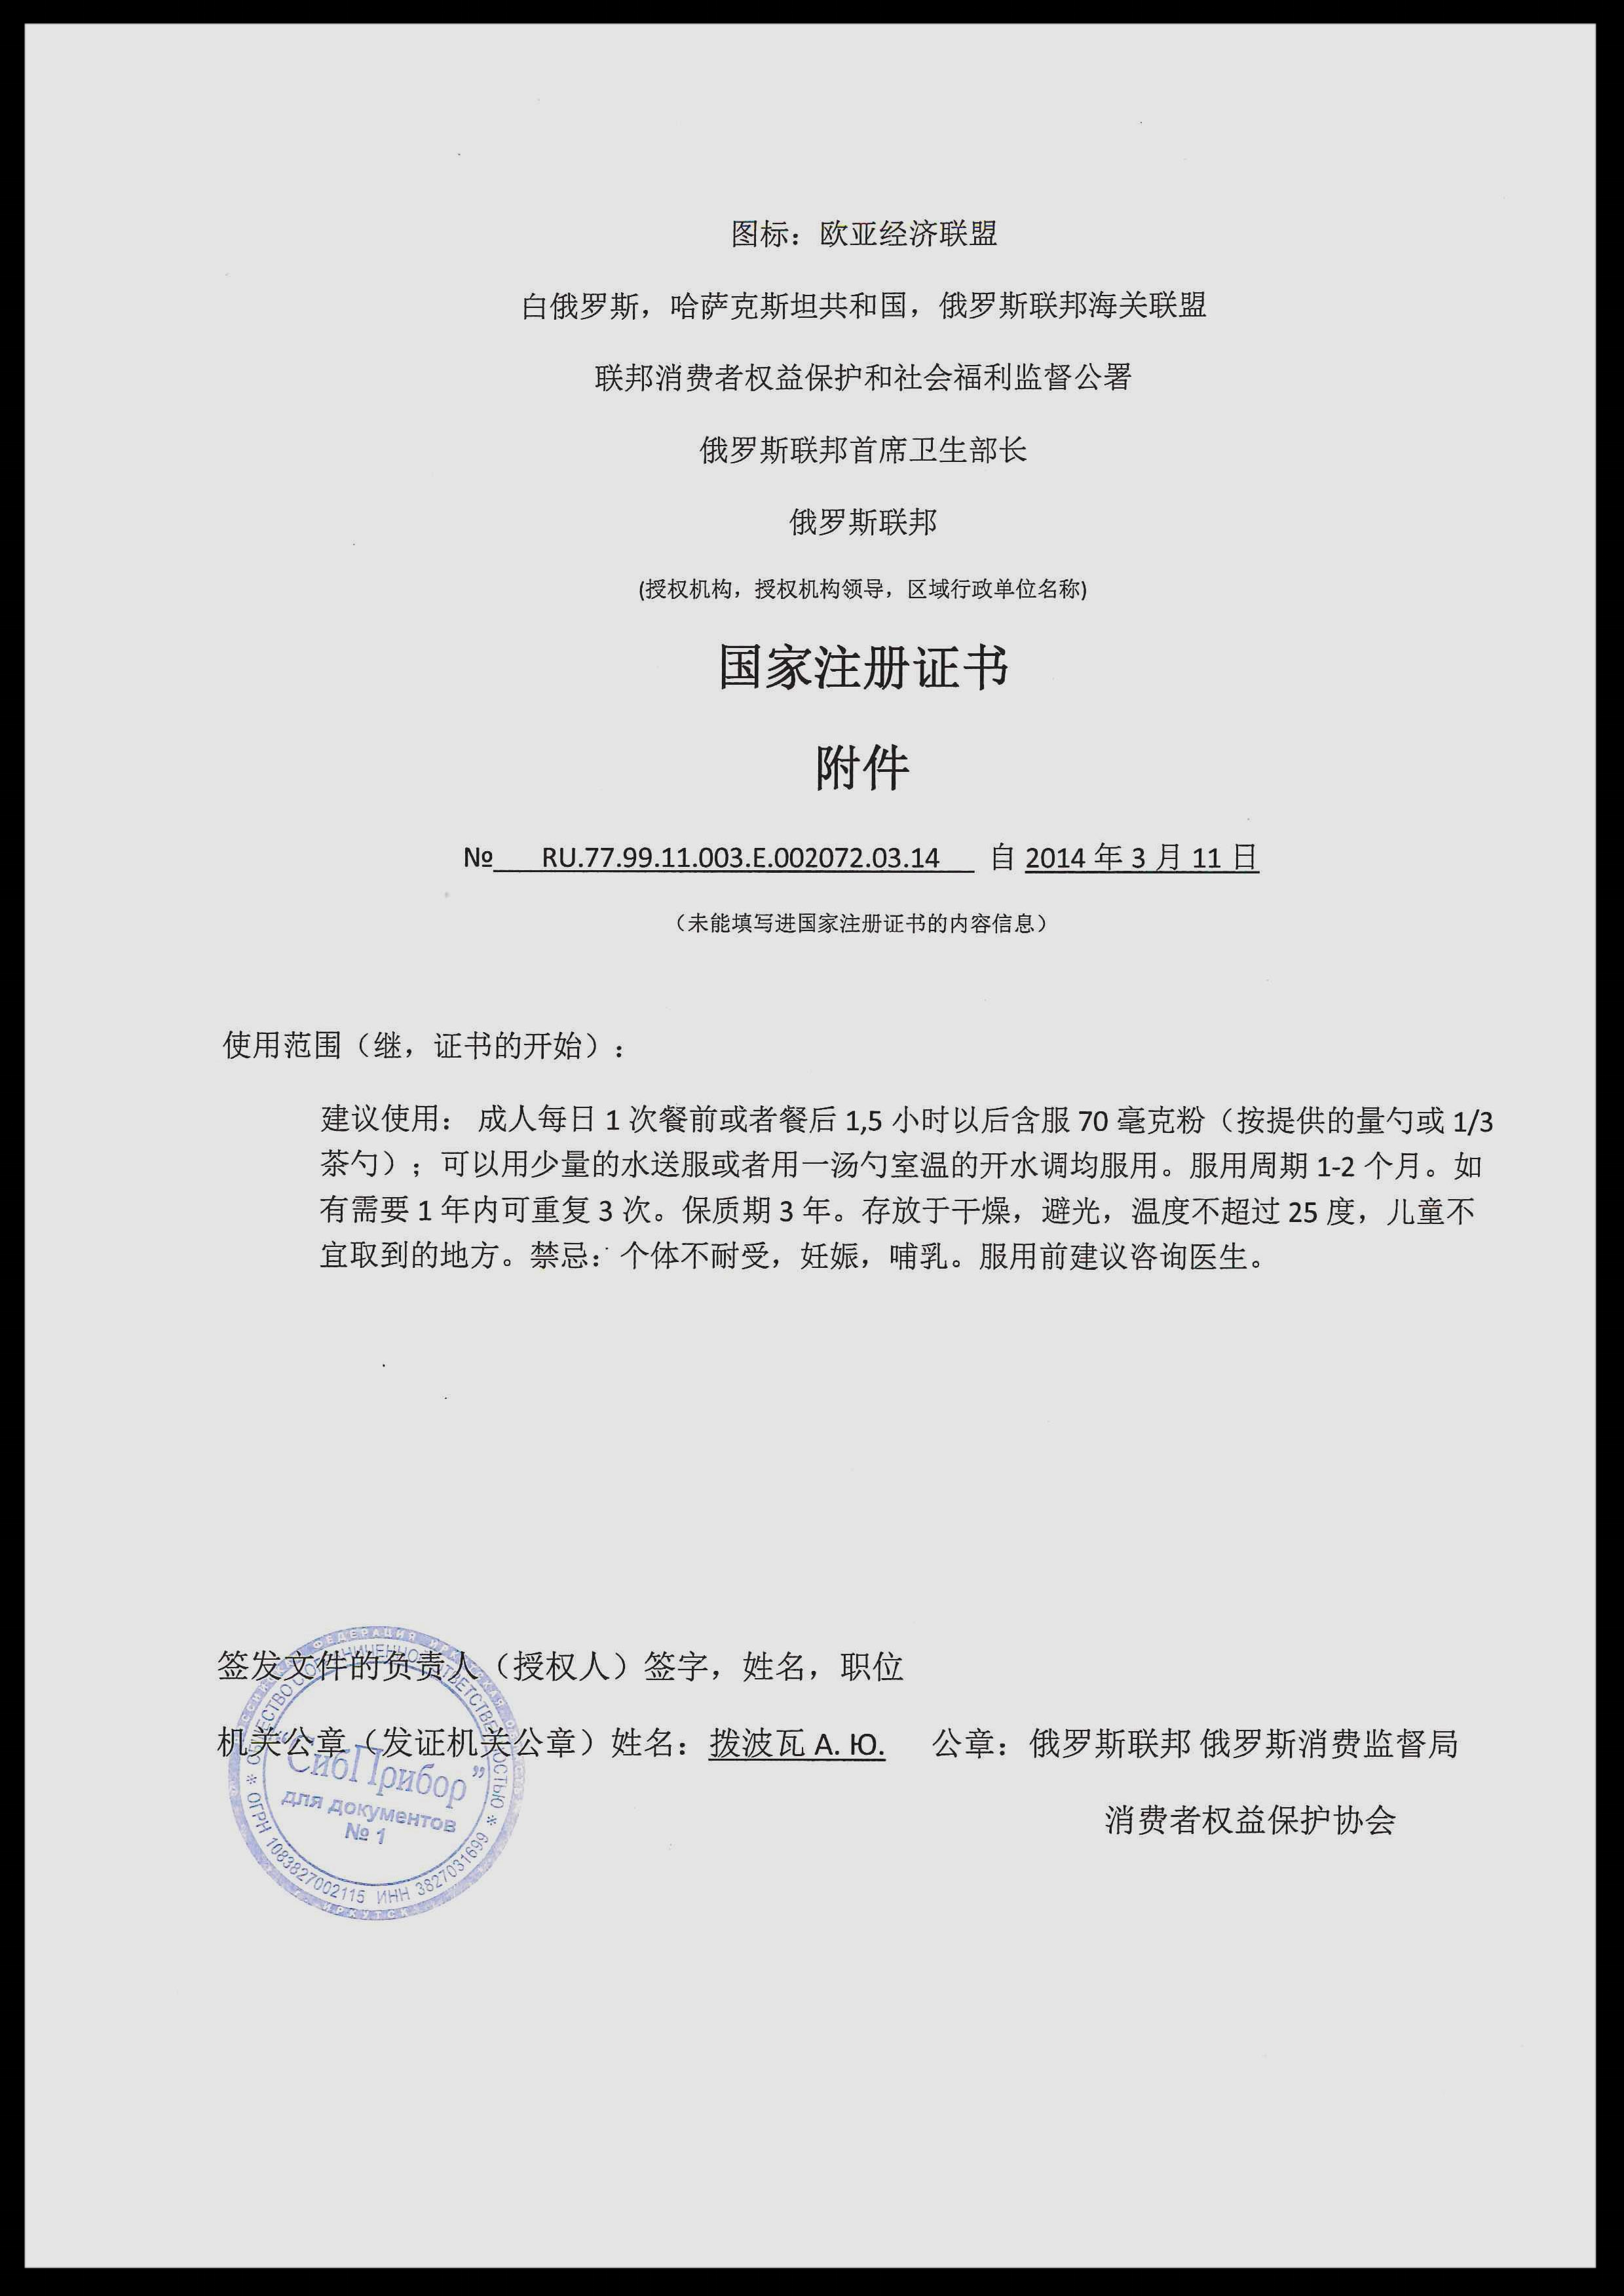 cert_taxif_china-1.jpg